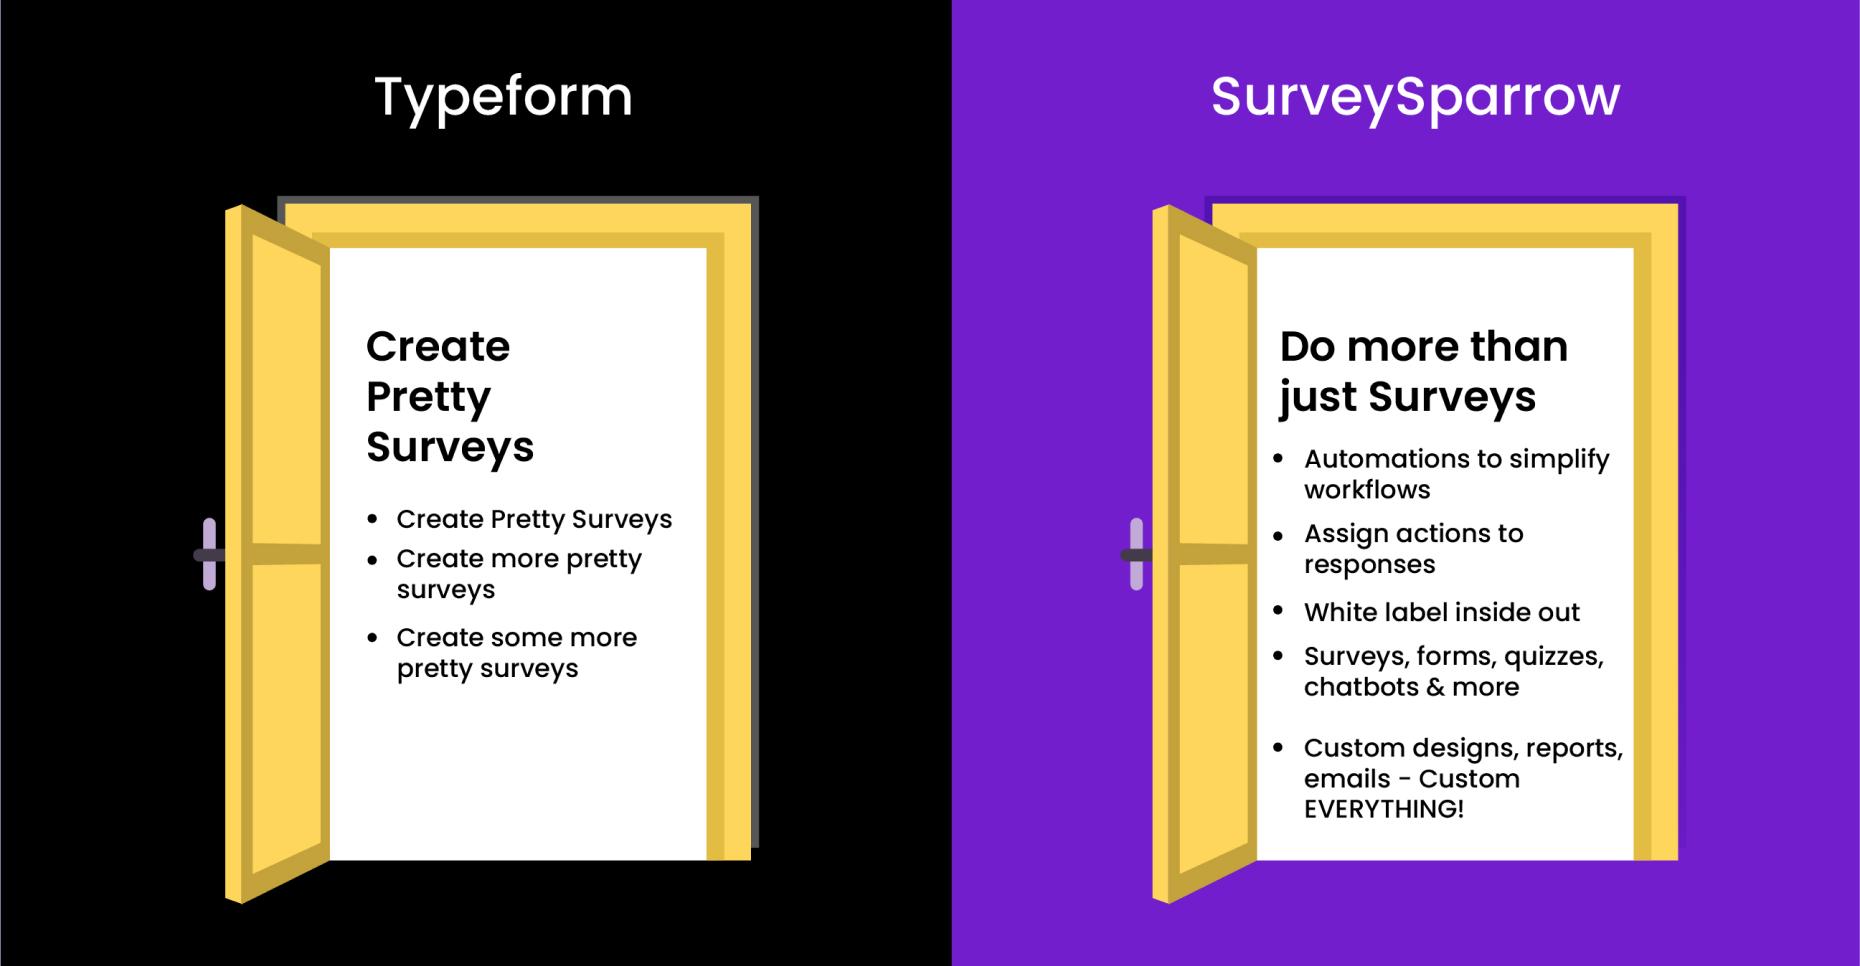 With Typeform you get to create pretty surveys, but SurveySparrow helps you do more than just surveys.